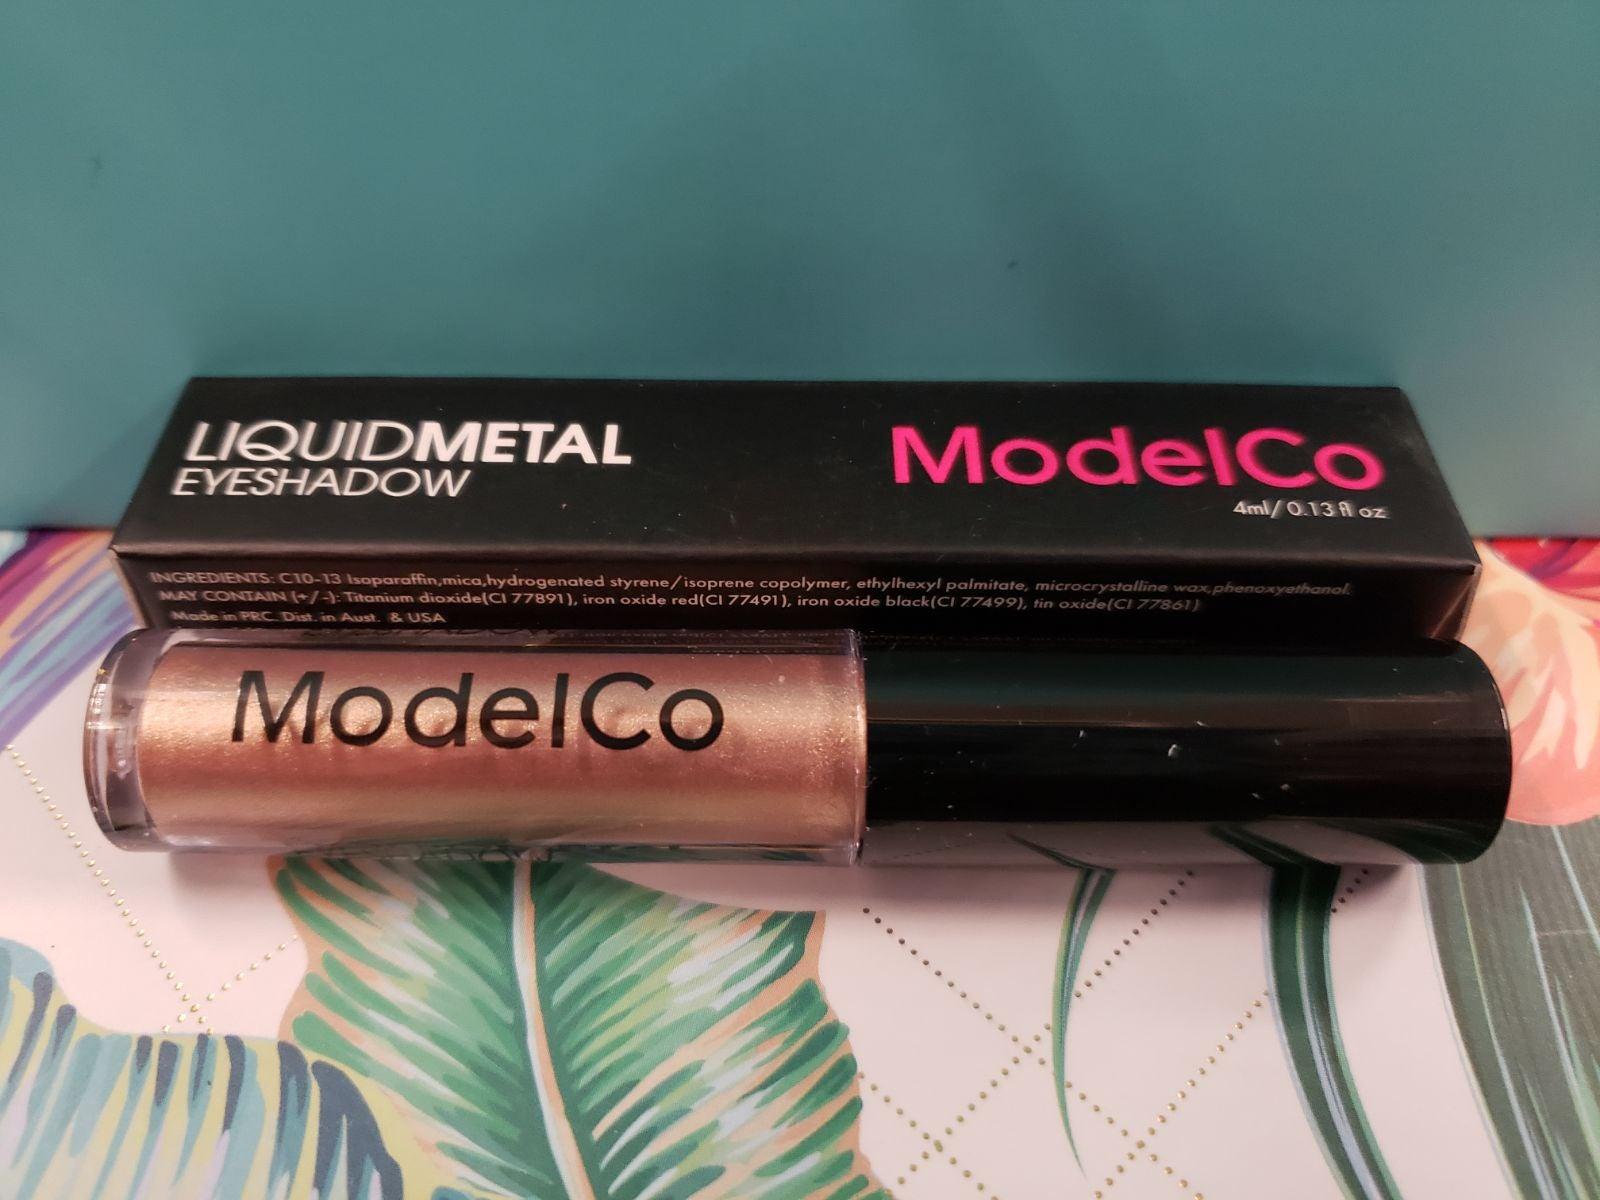 Model Co Liquid eyeshadow champagne